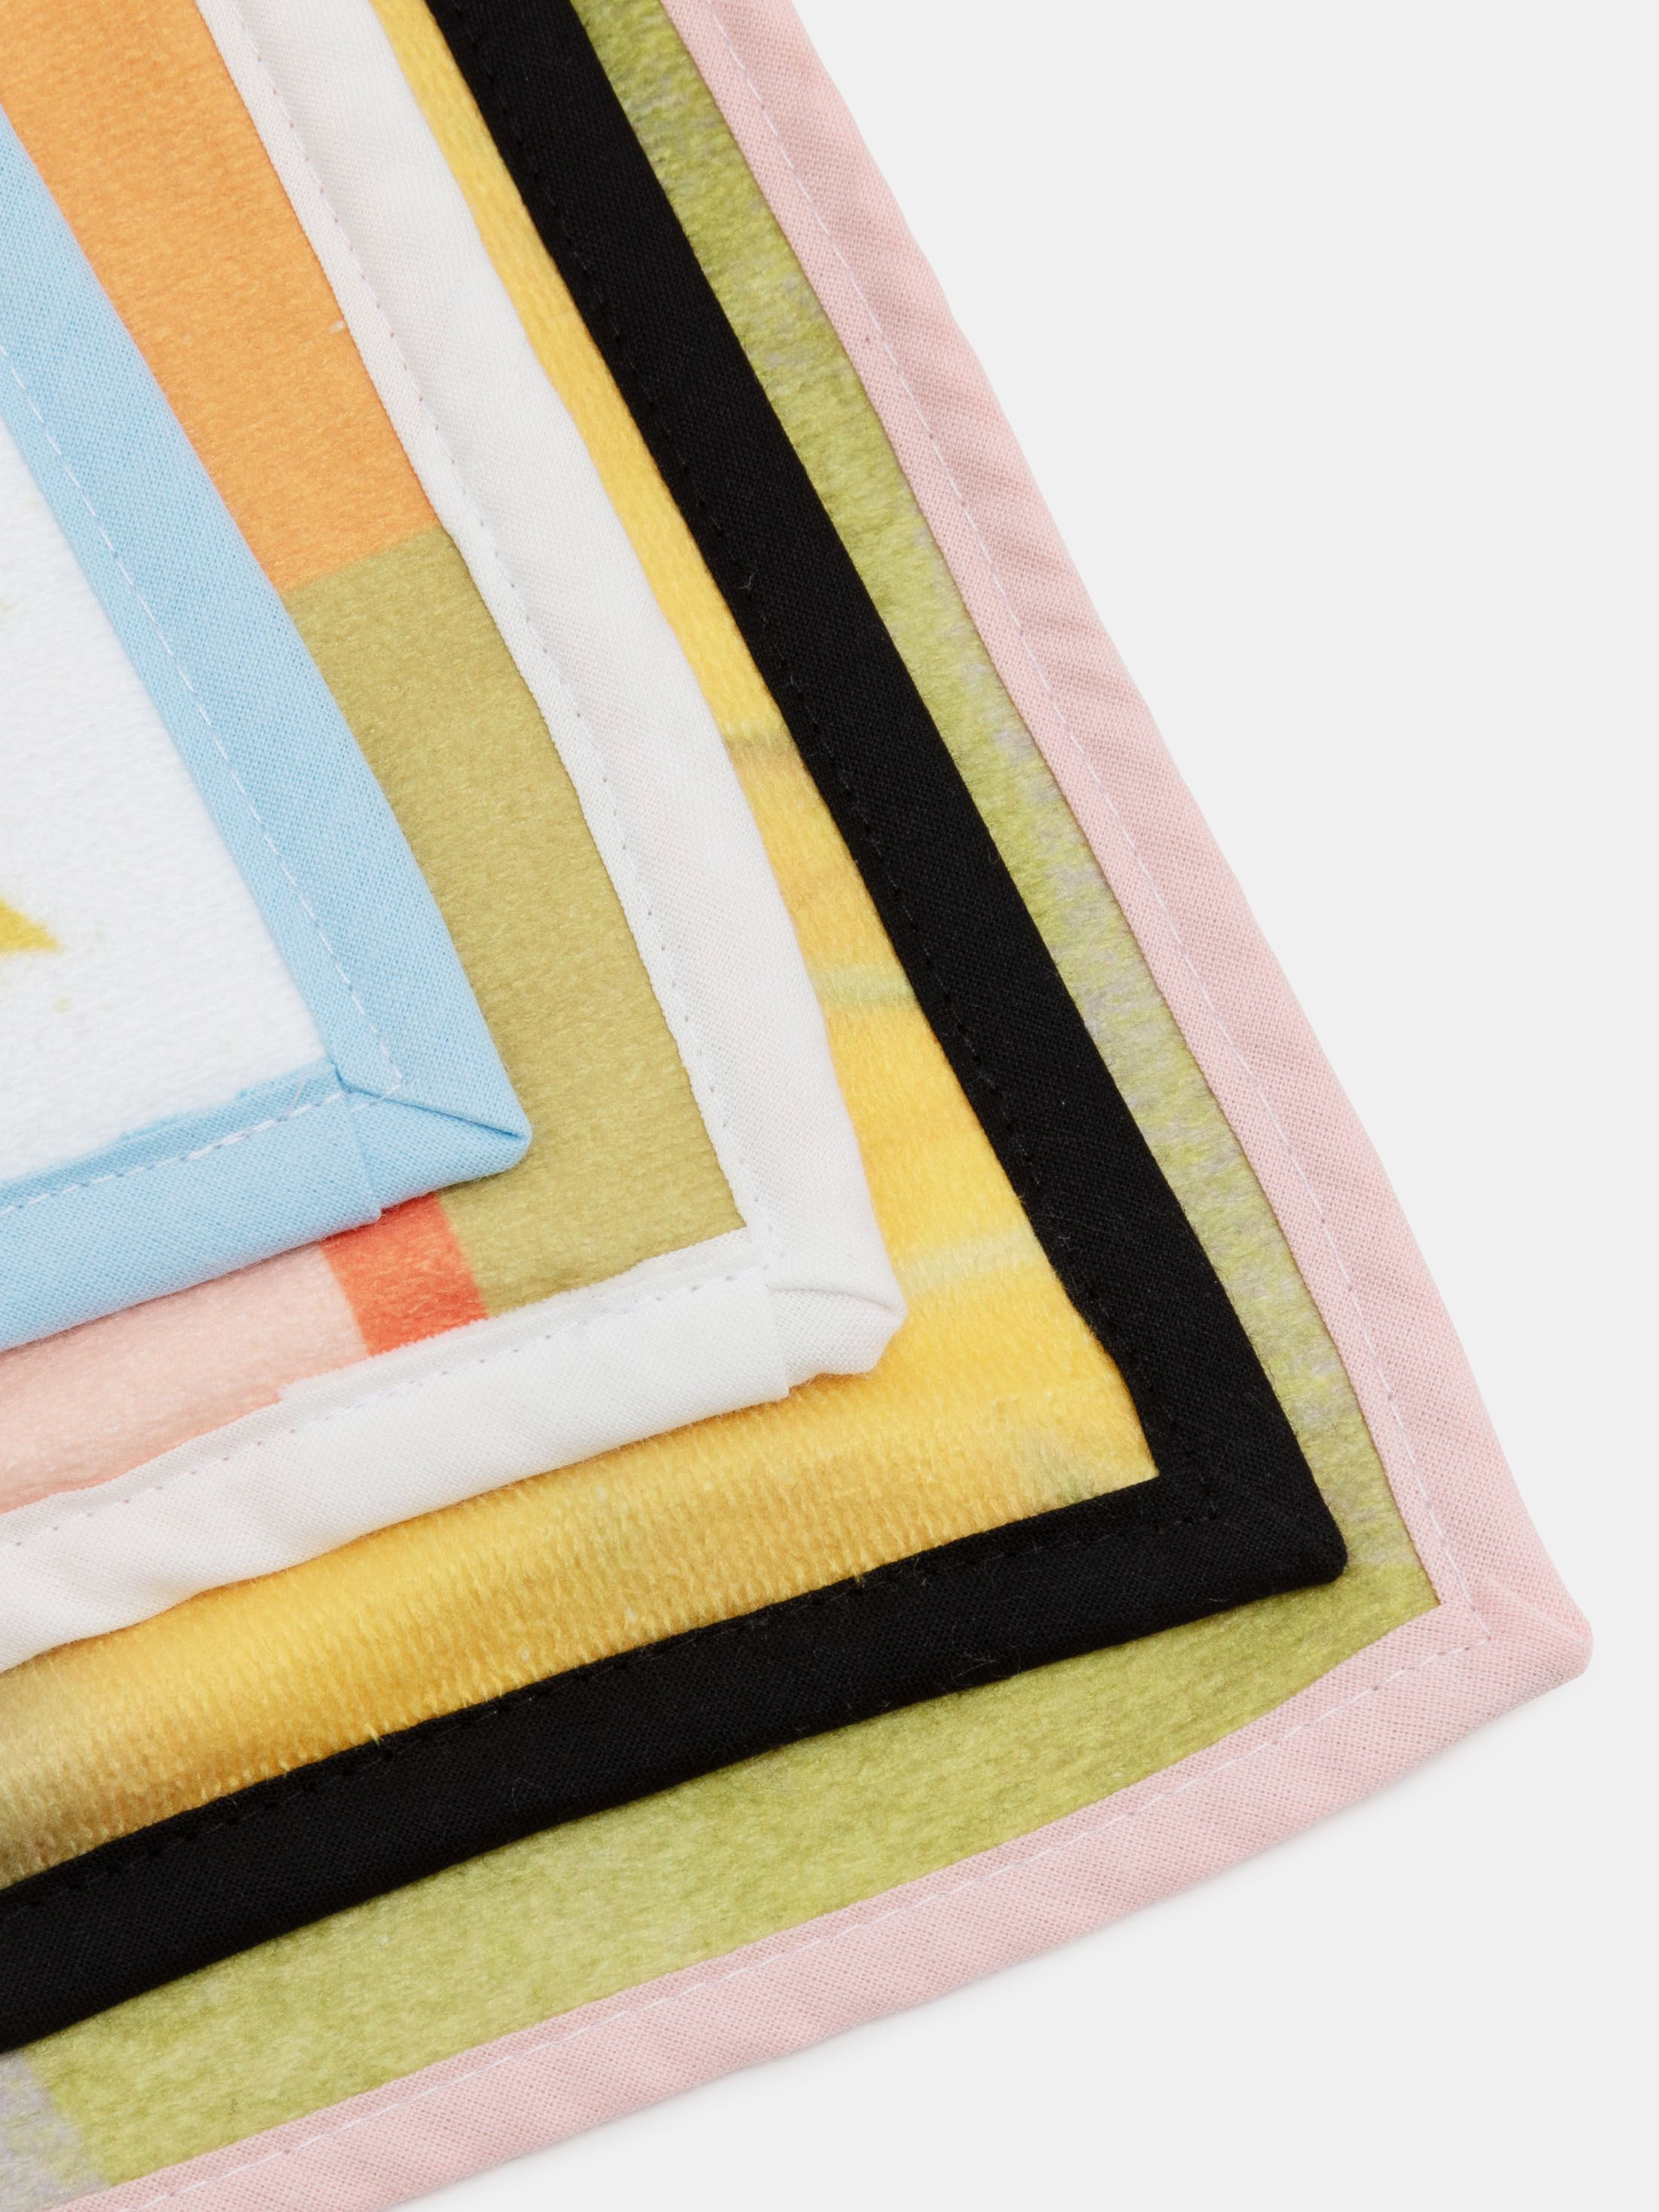 binding colors beach towels